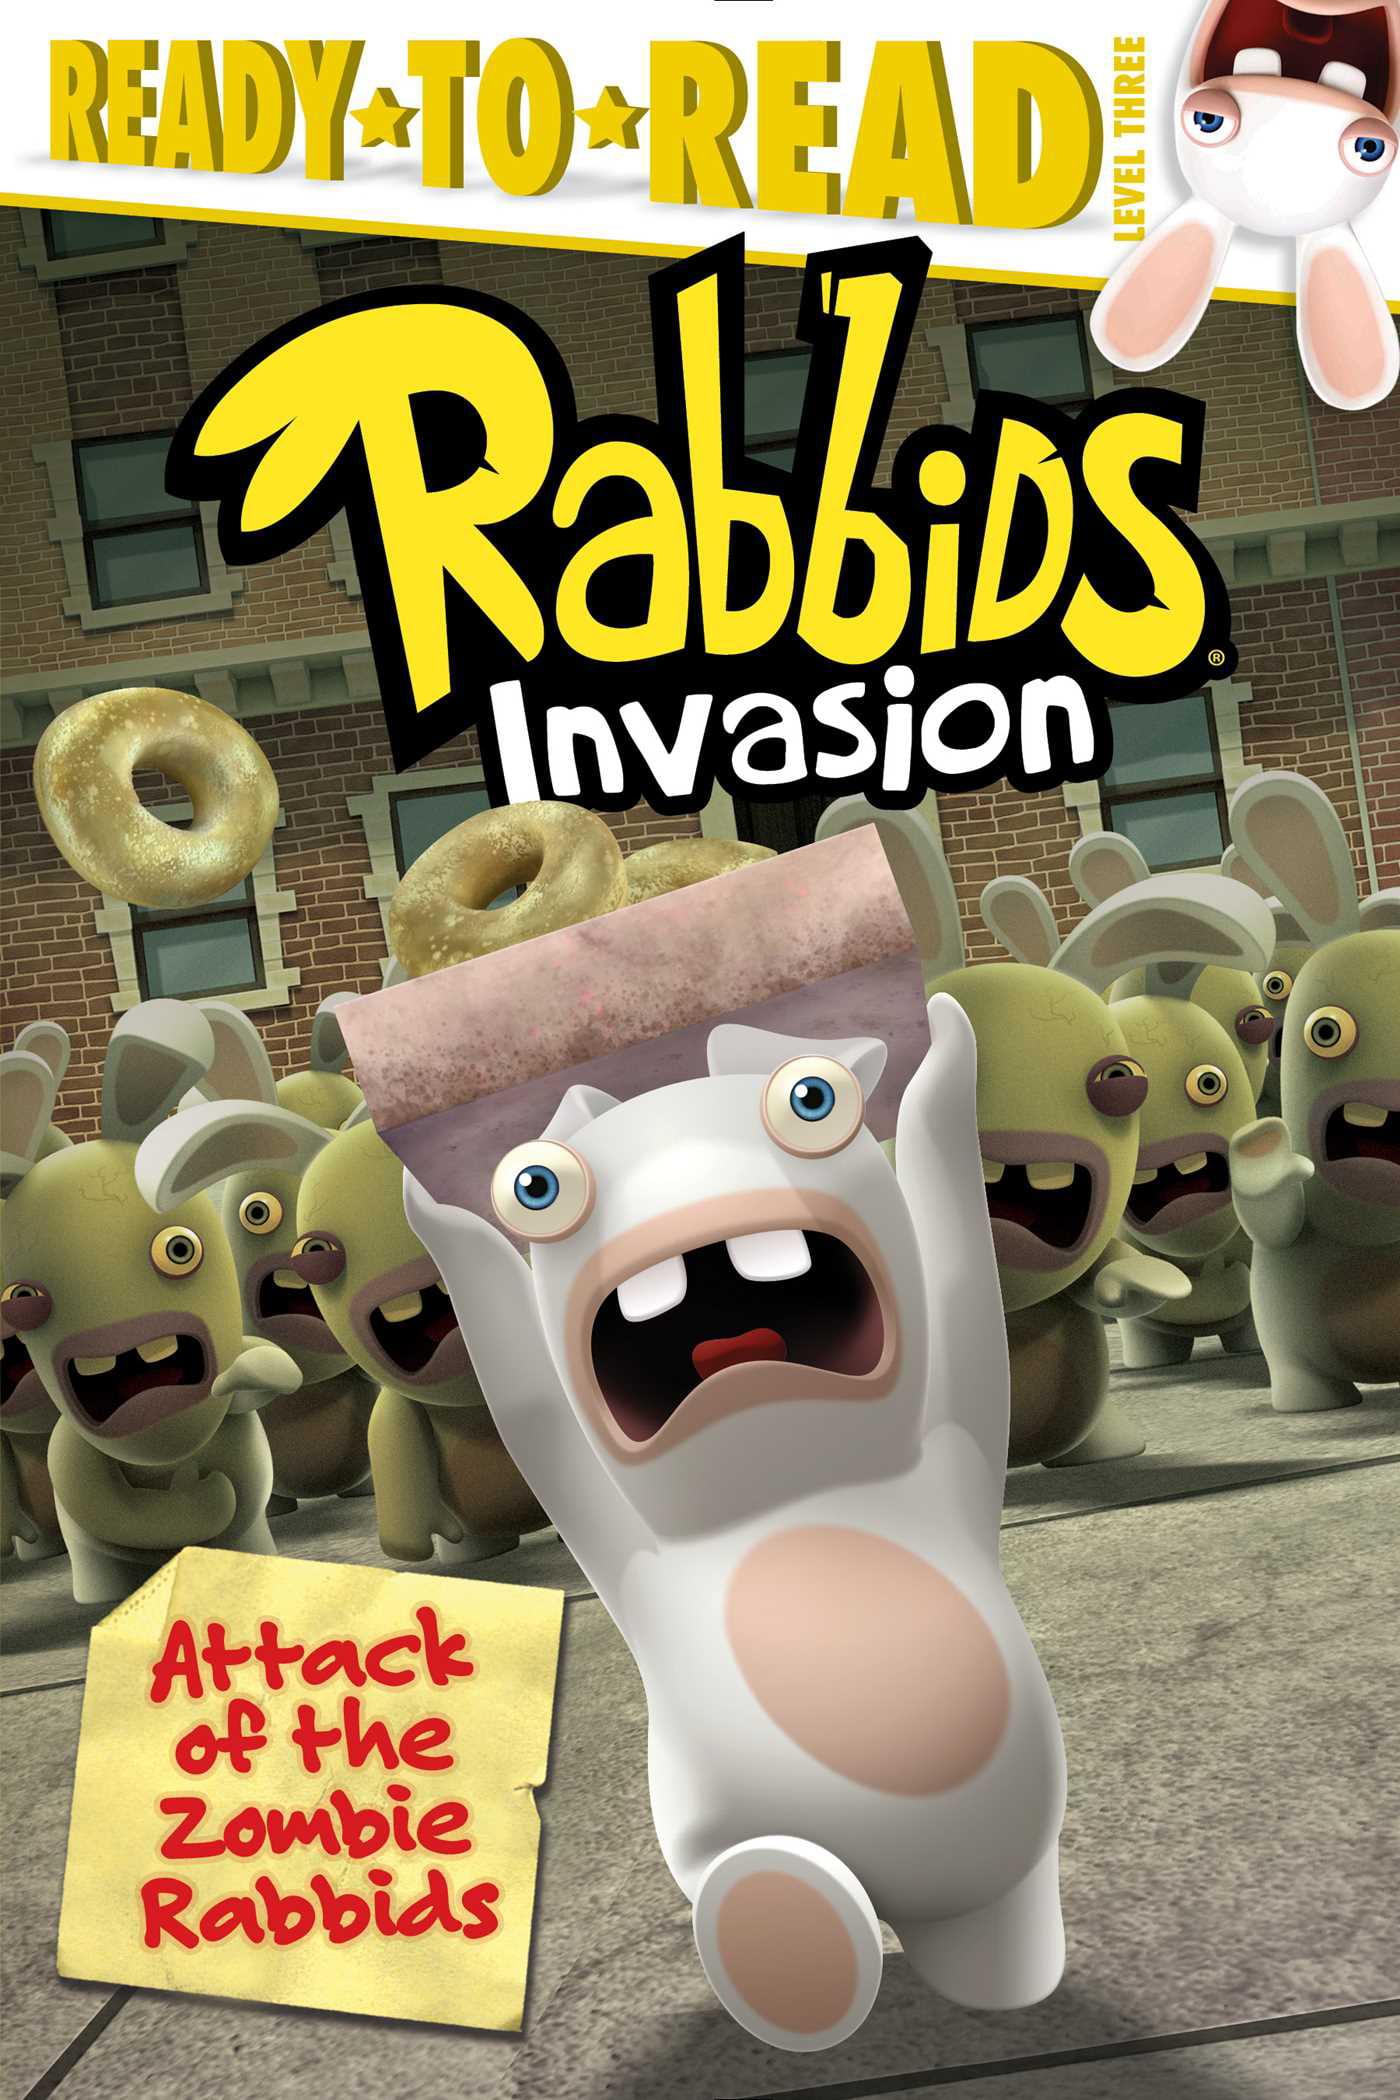 Attack of the Zombie Rabbids by Simon Spotlight